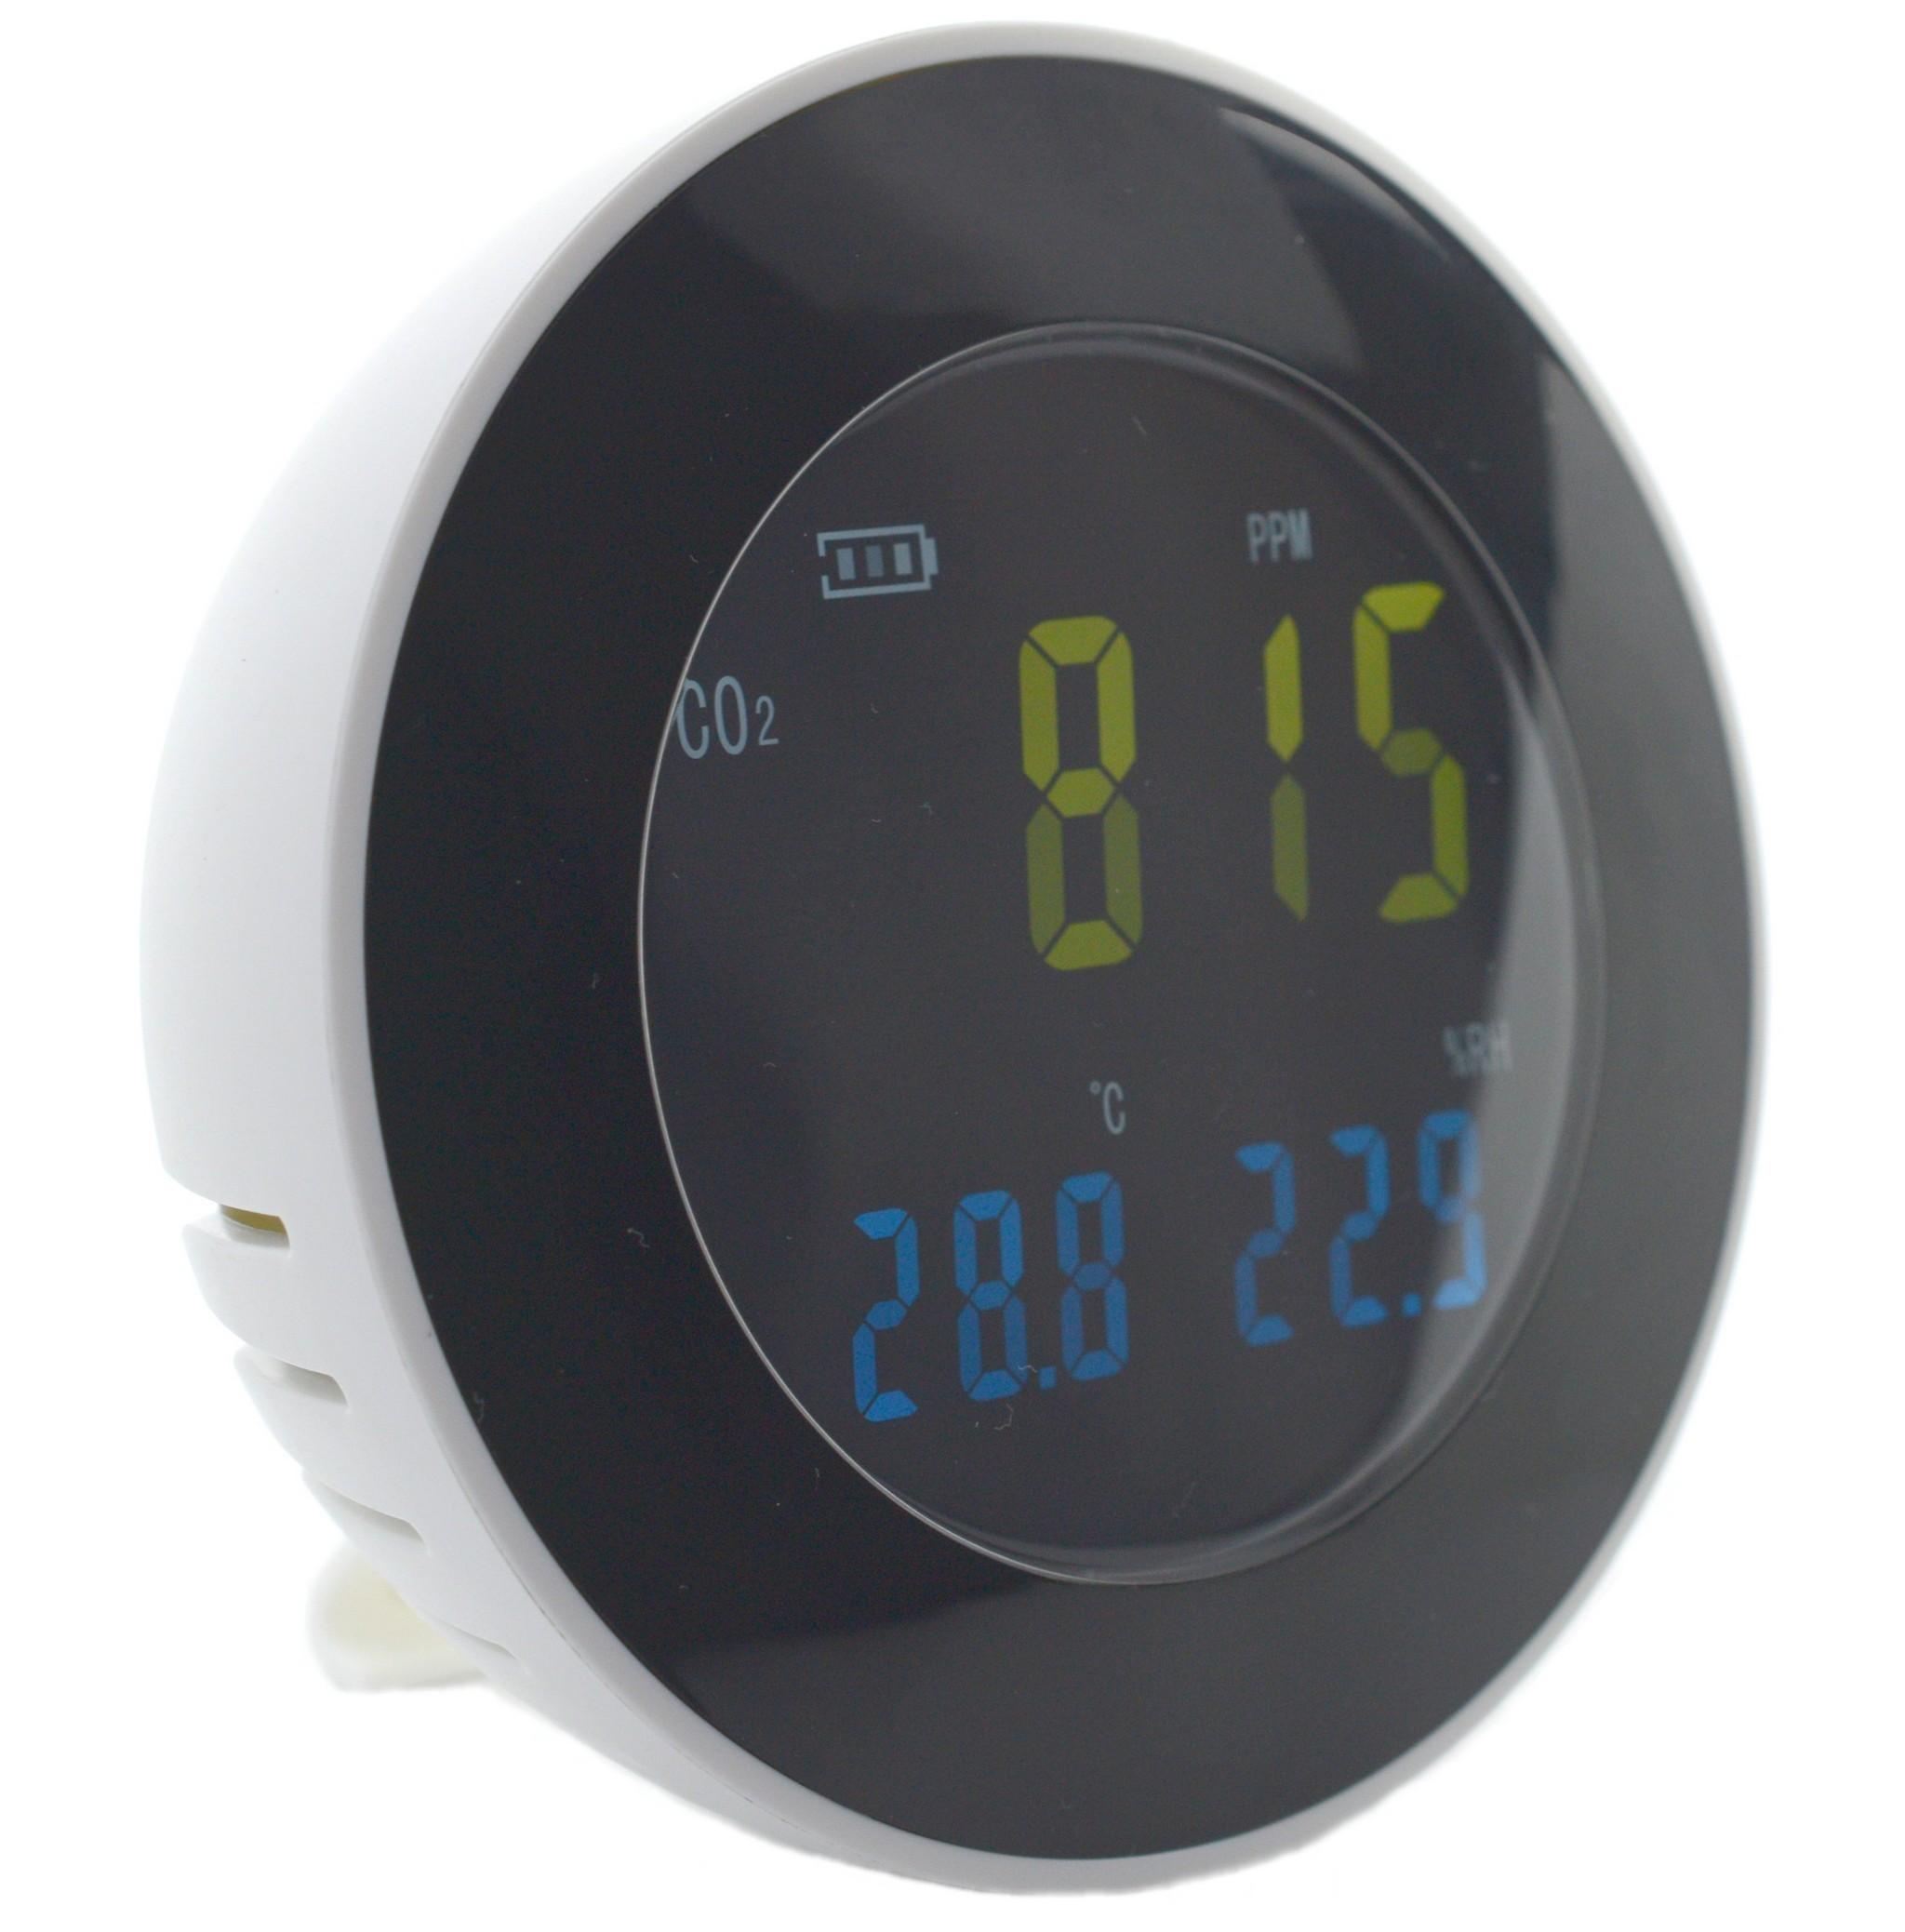 XINTEST HT-501 CO2 Meter - liutyi info